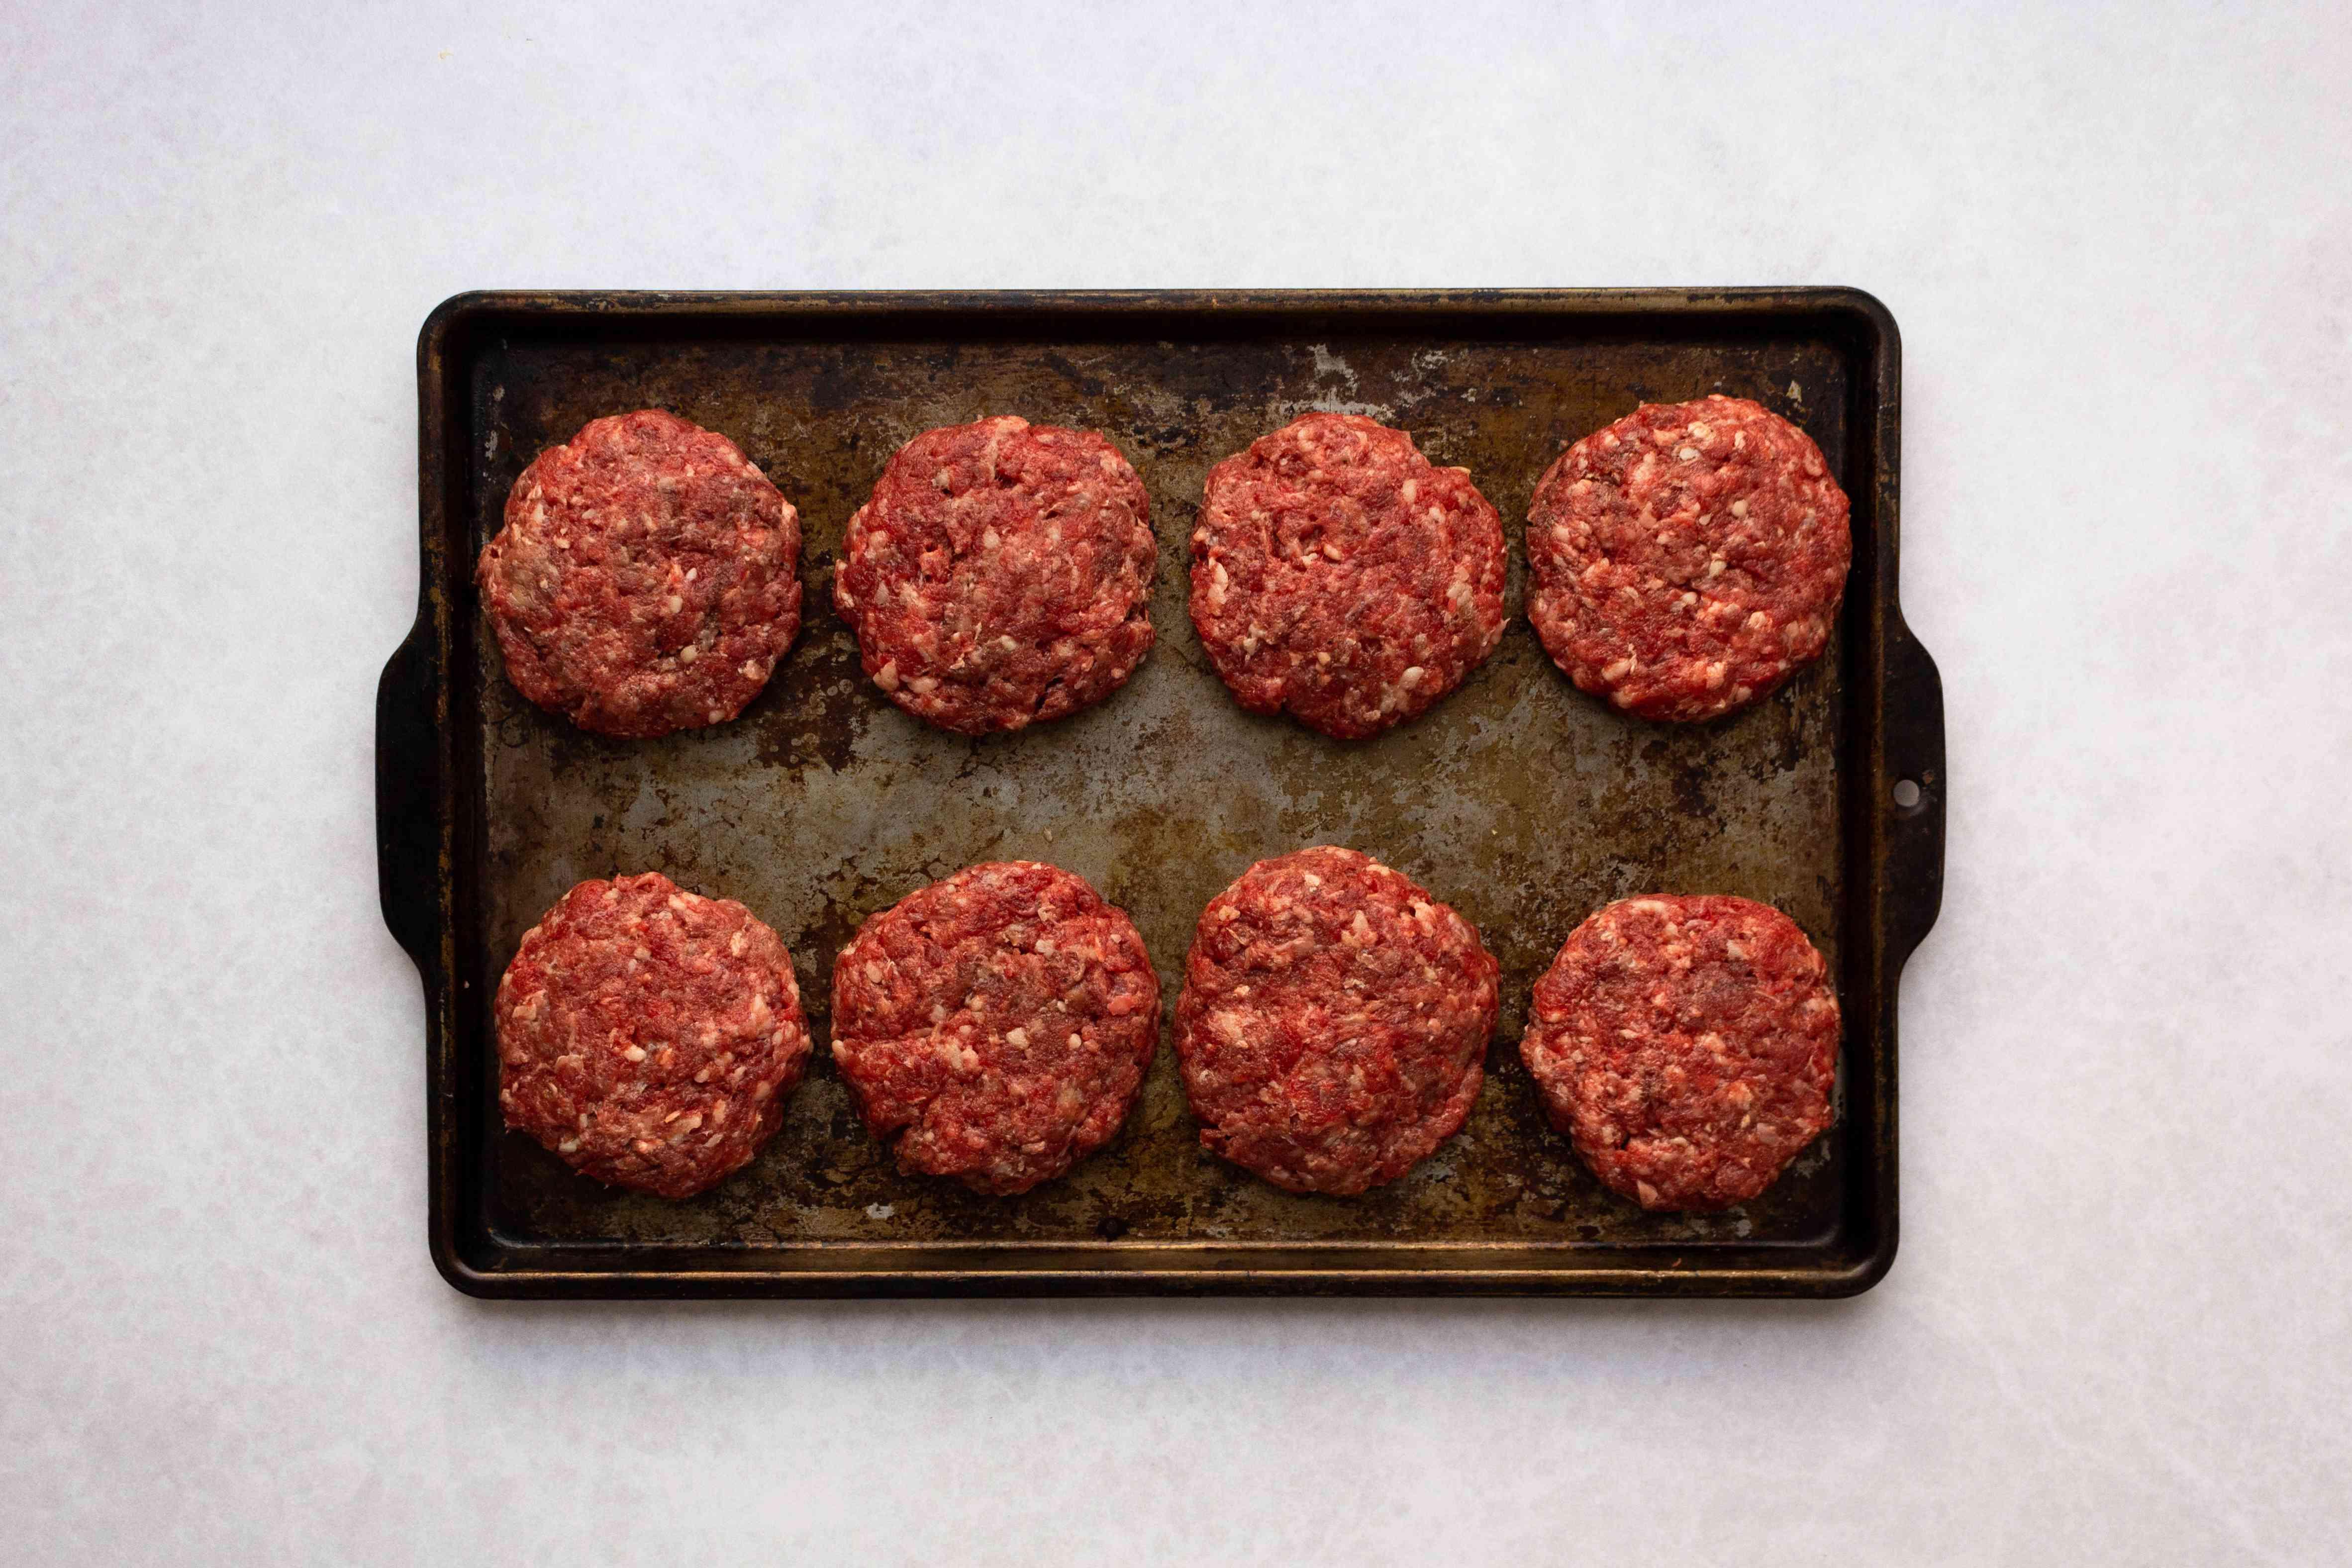 shaped hamburger patties on baking sheet